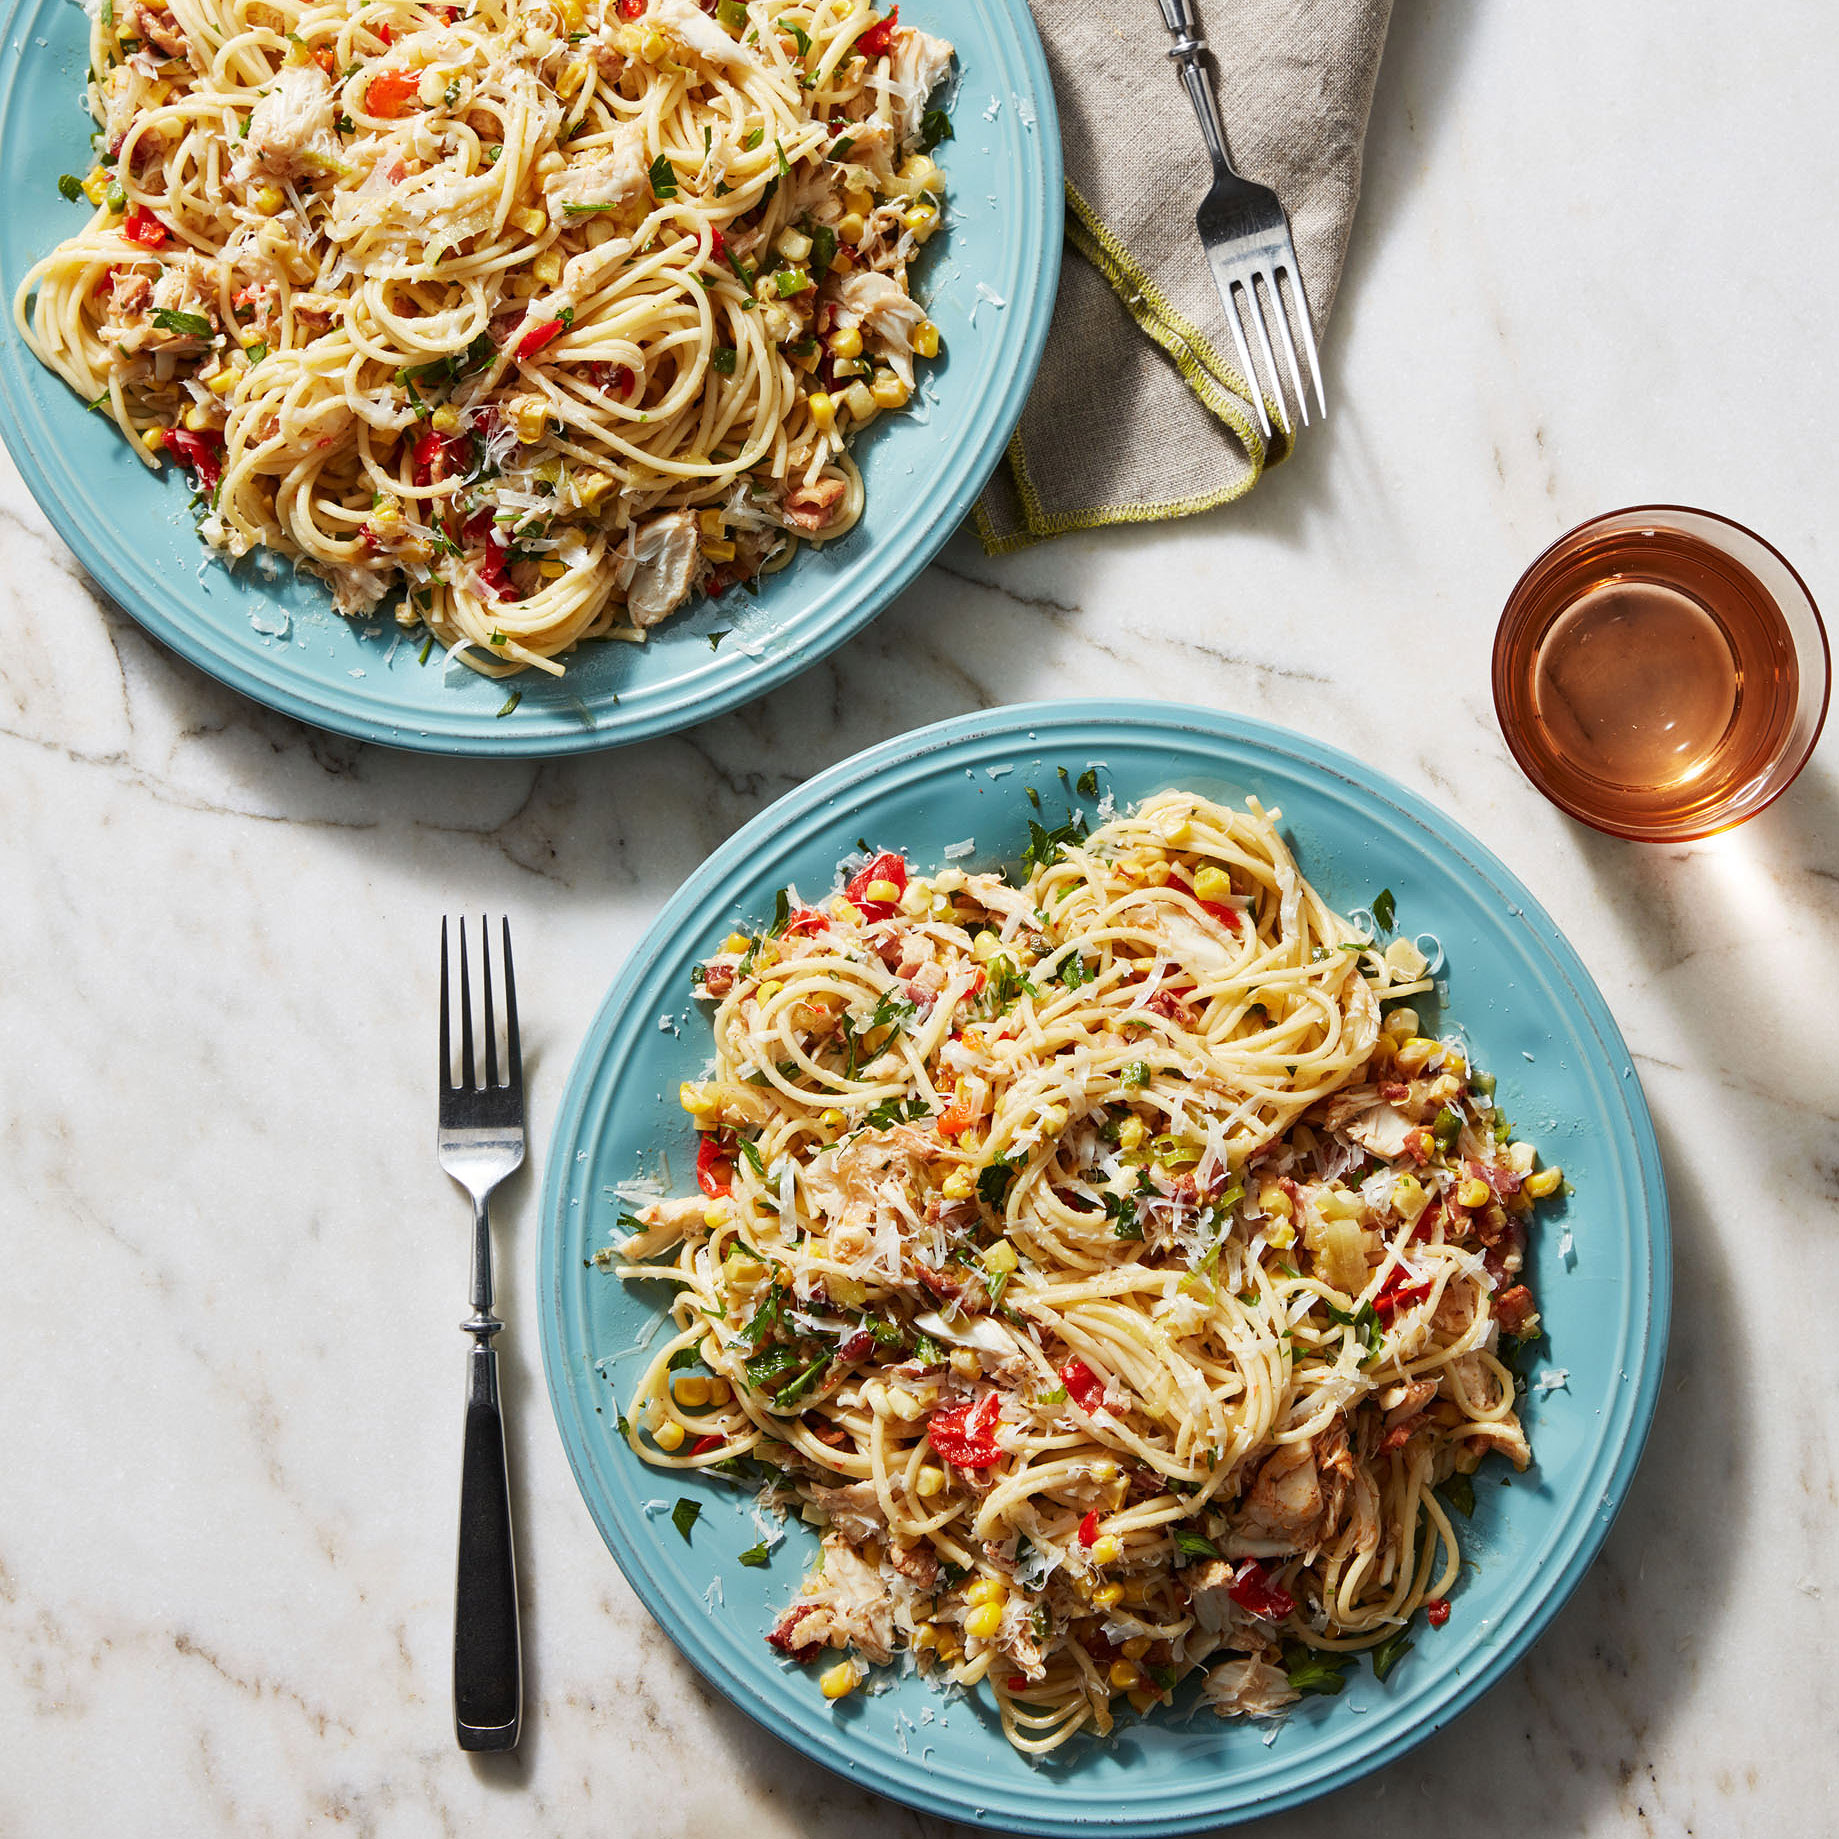 Crabby & Corny Spaghetti